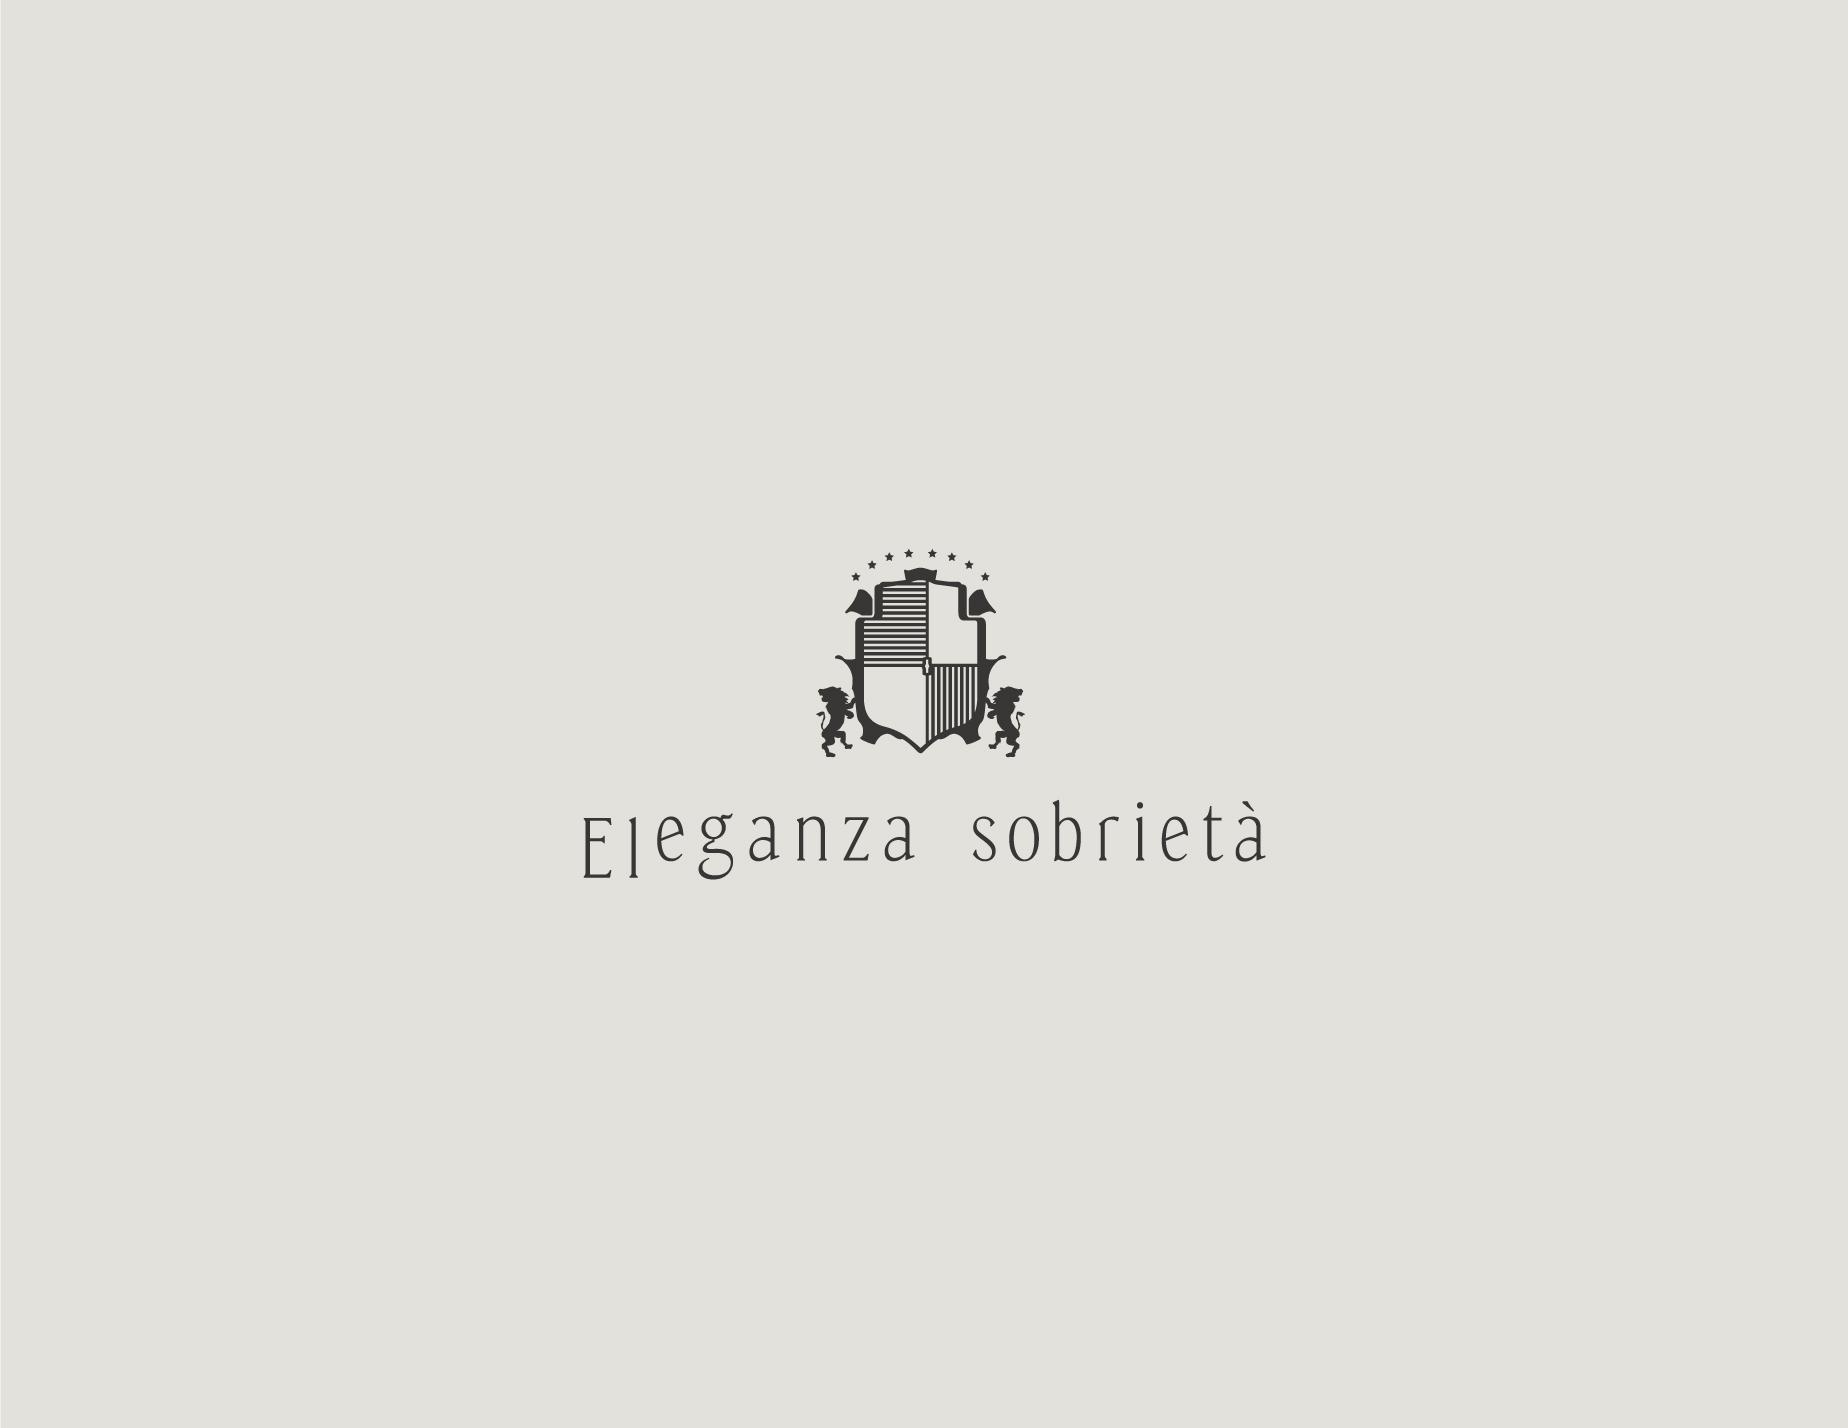 Eleganza-sobrieta_LOGO_fin.jpg